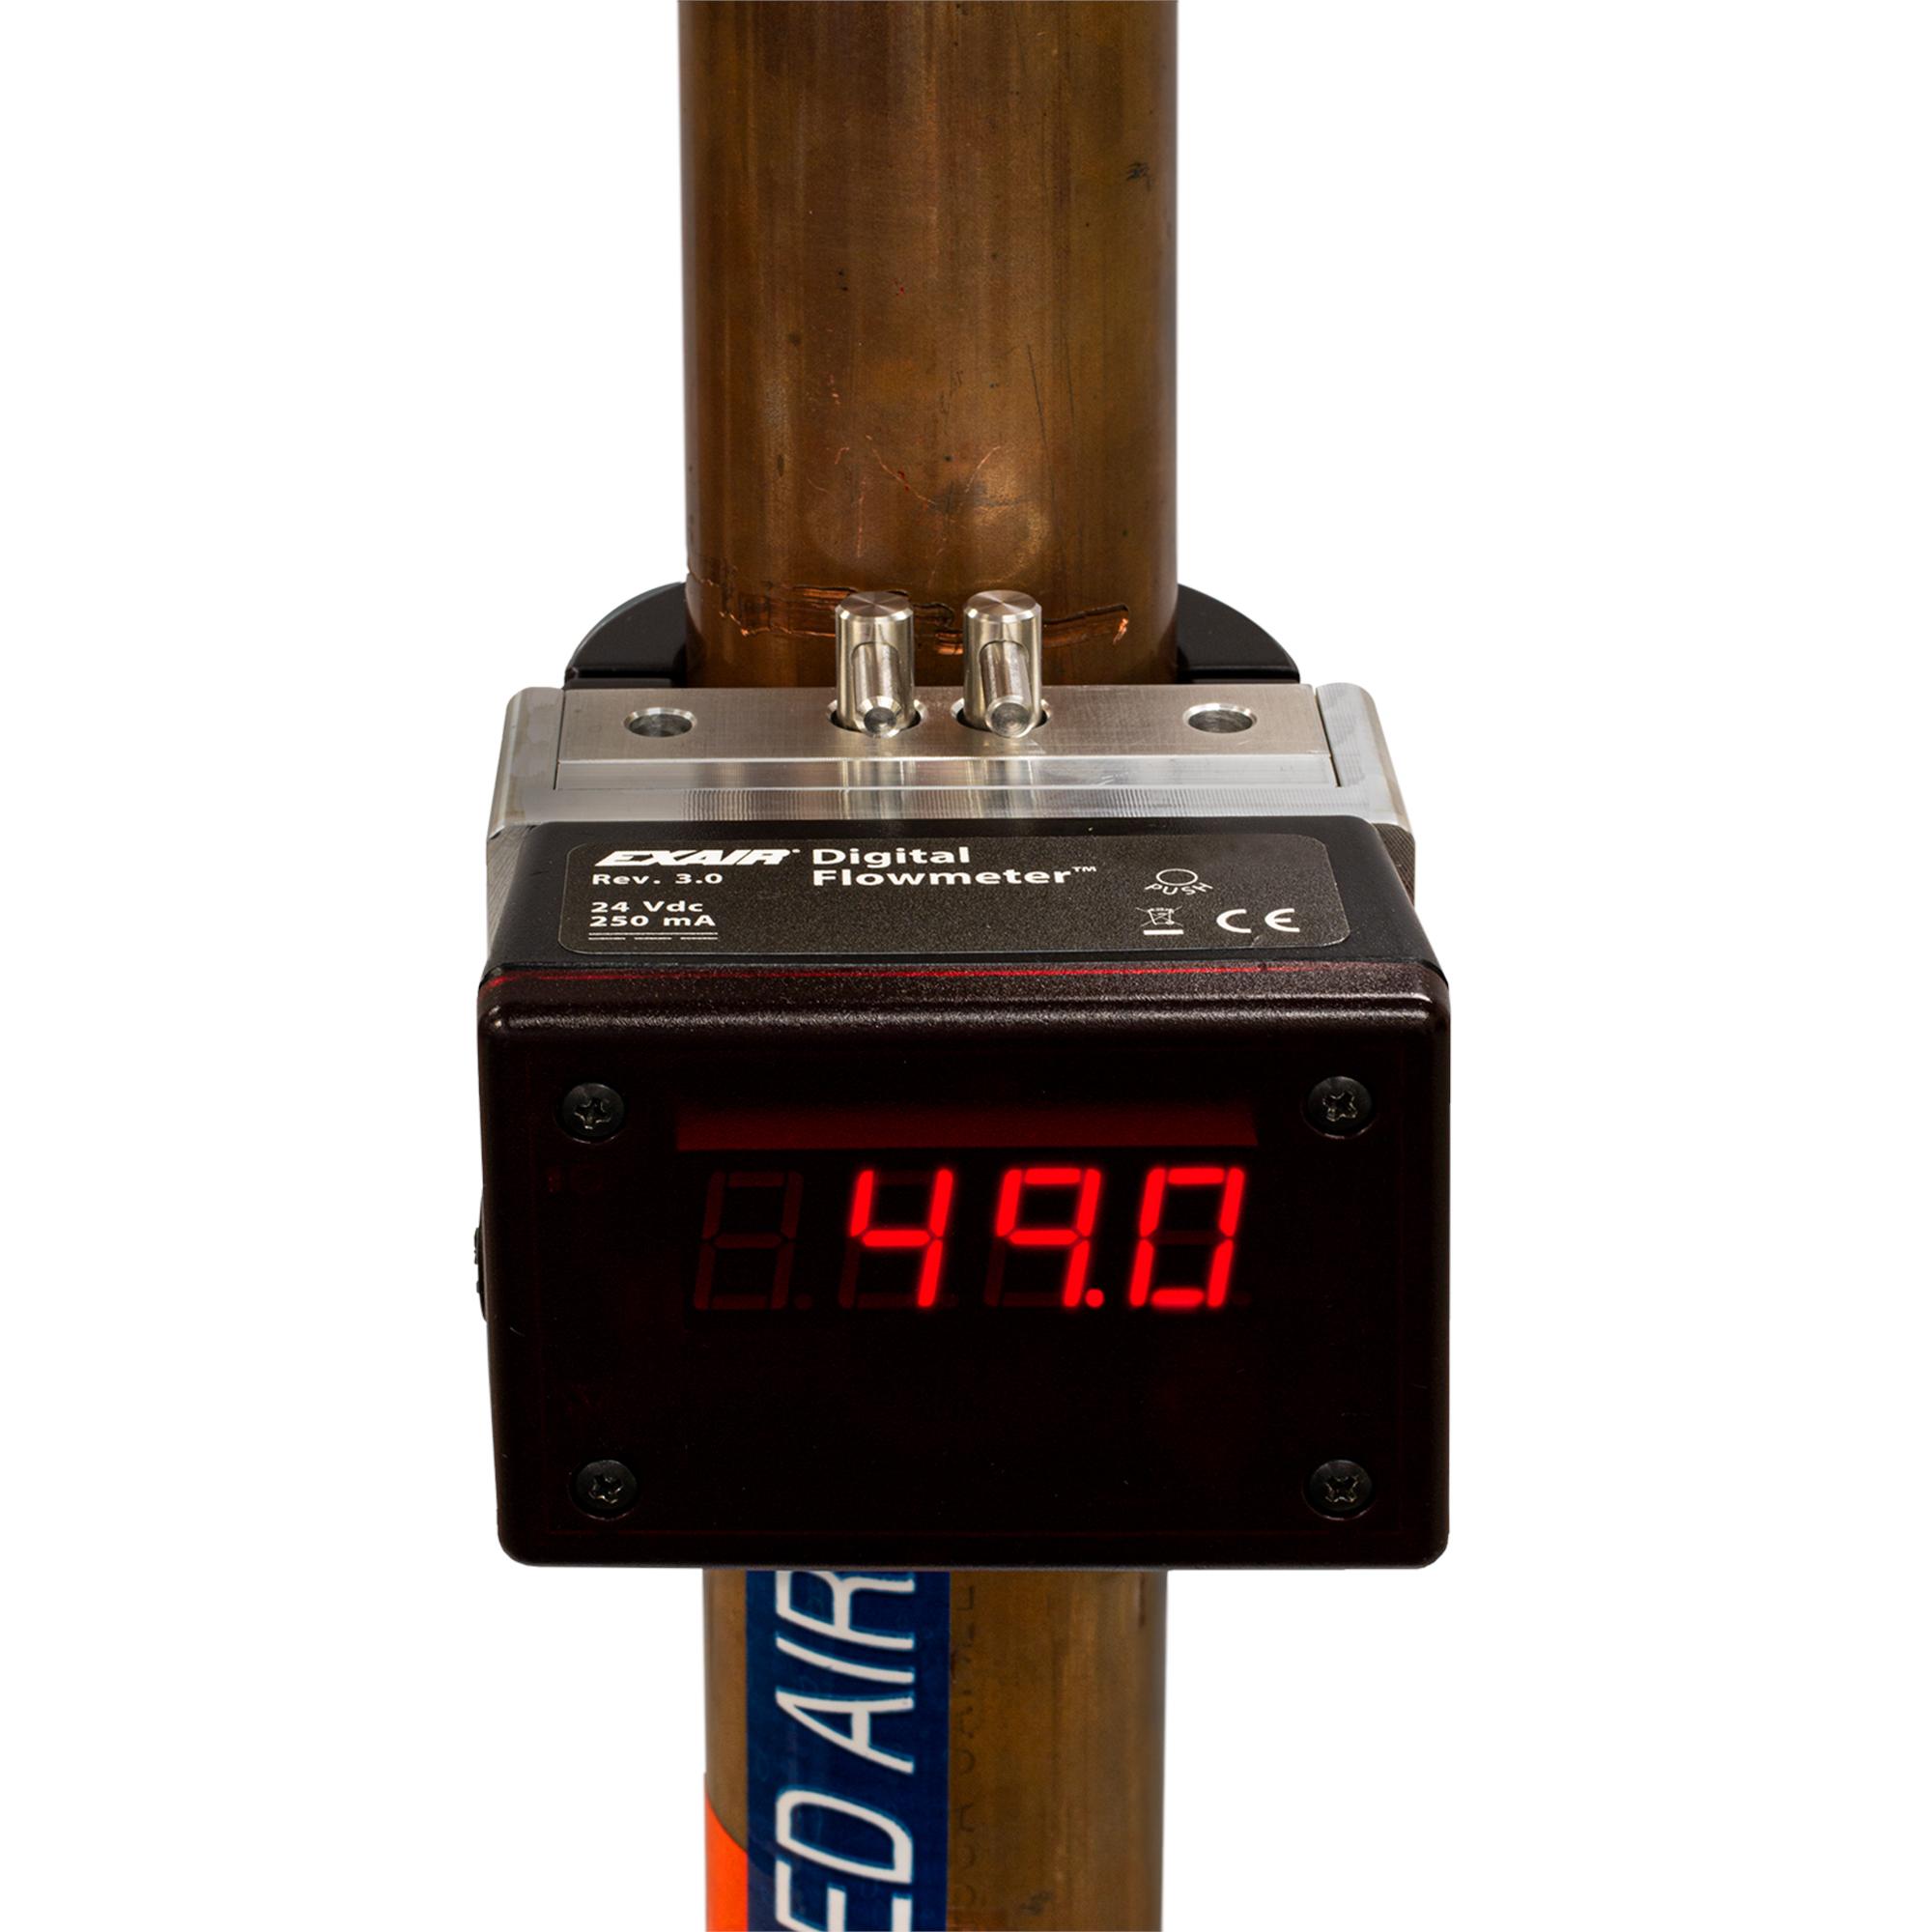 EXAIR's Hot Tap Digital Flowmeter allows for installation under pressure.